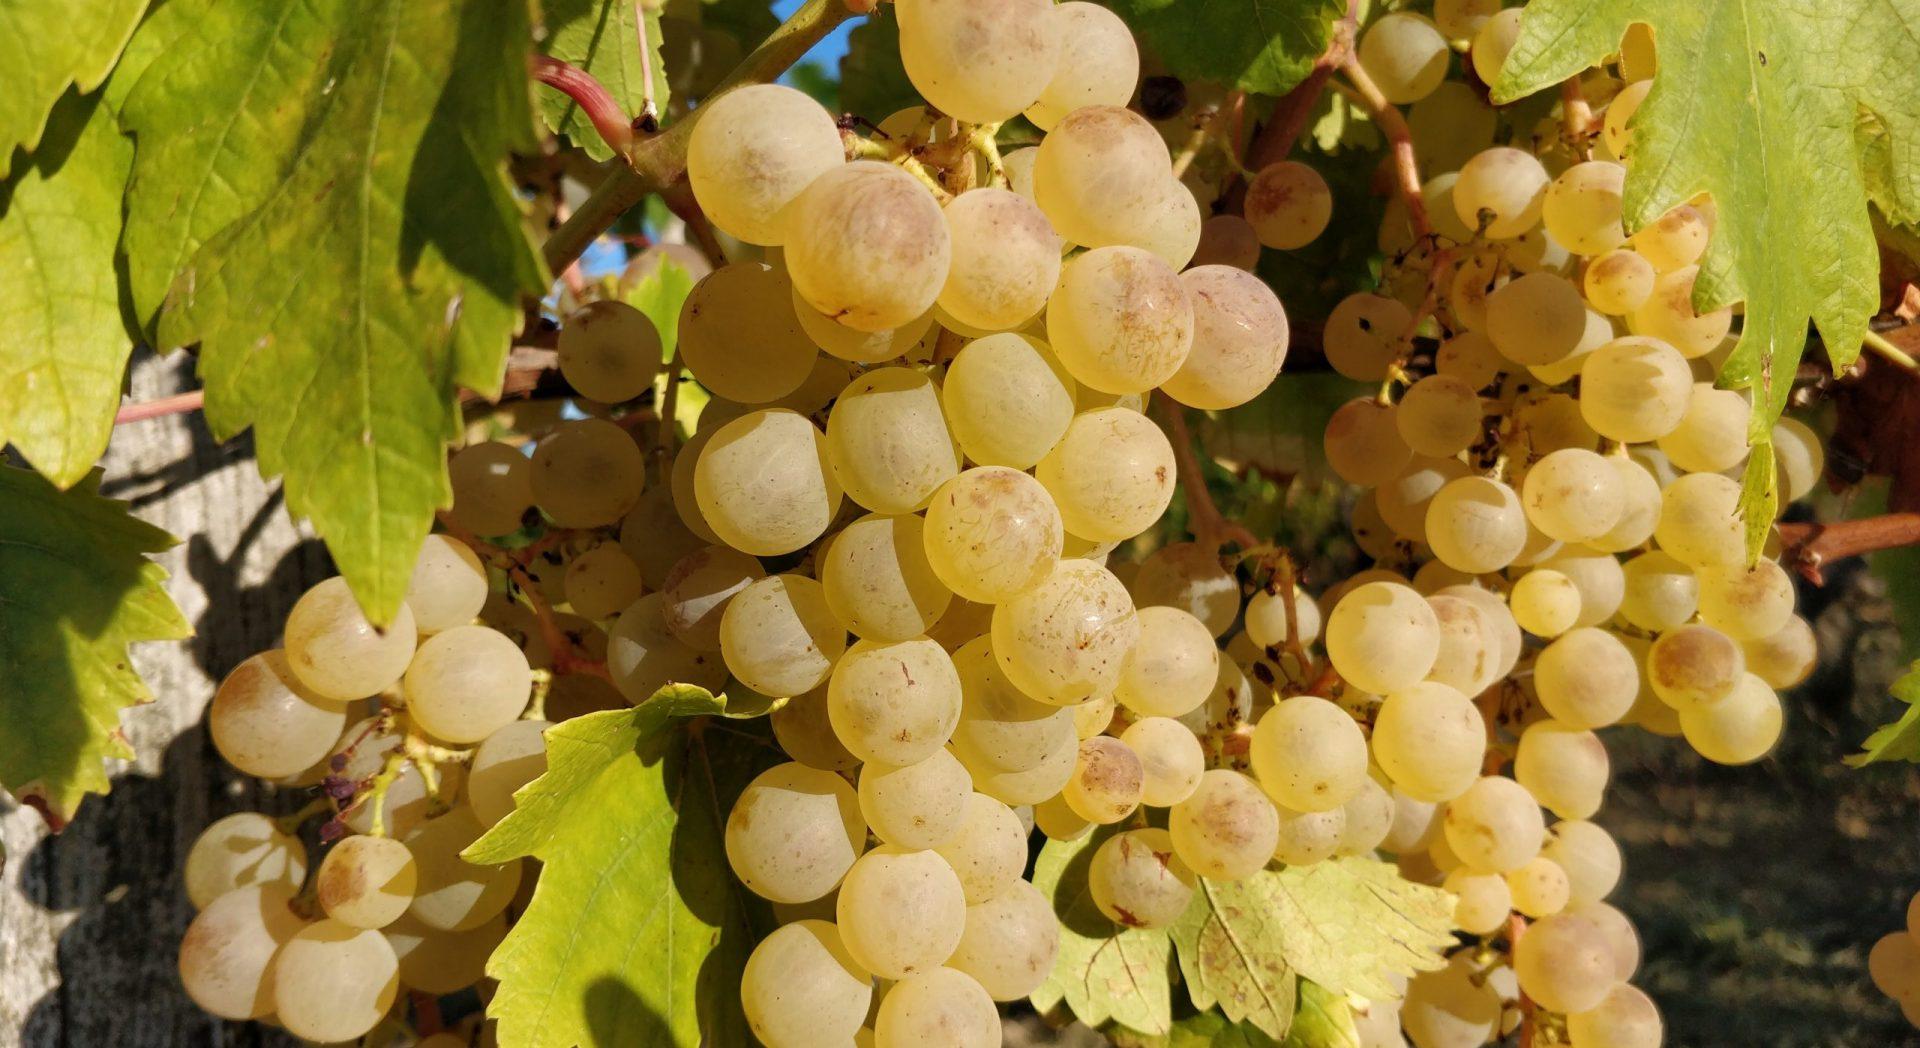 vente-directe-raisins-des-garennettes-tarn-et-garonne